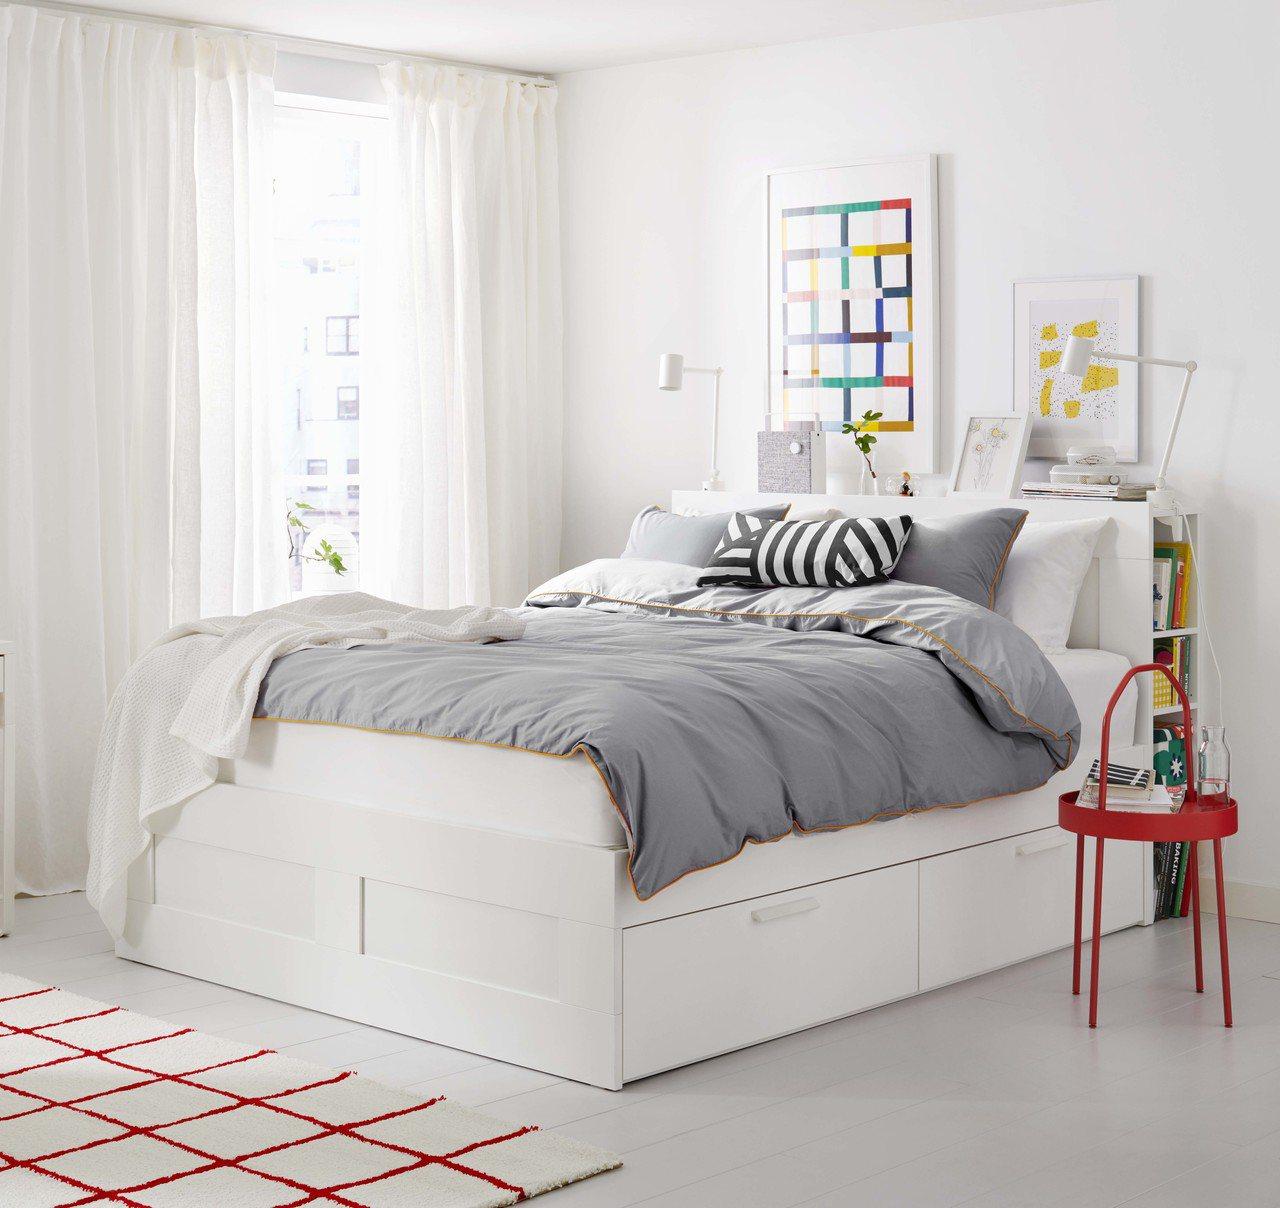 BRIMNES床框附抽屜/床頭板(白色Luröy),售價12,490元。圖/IK...